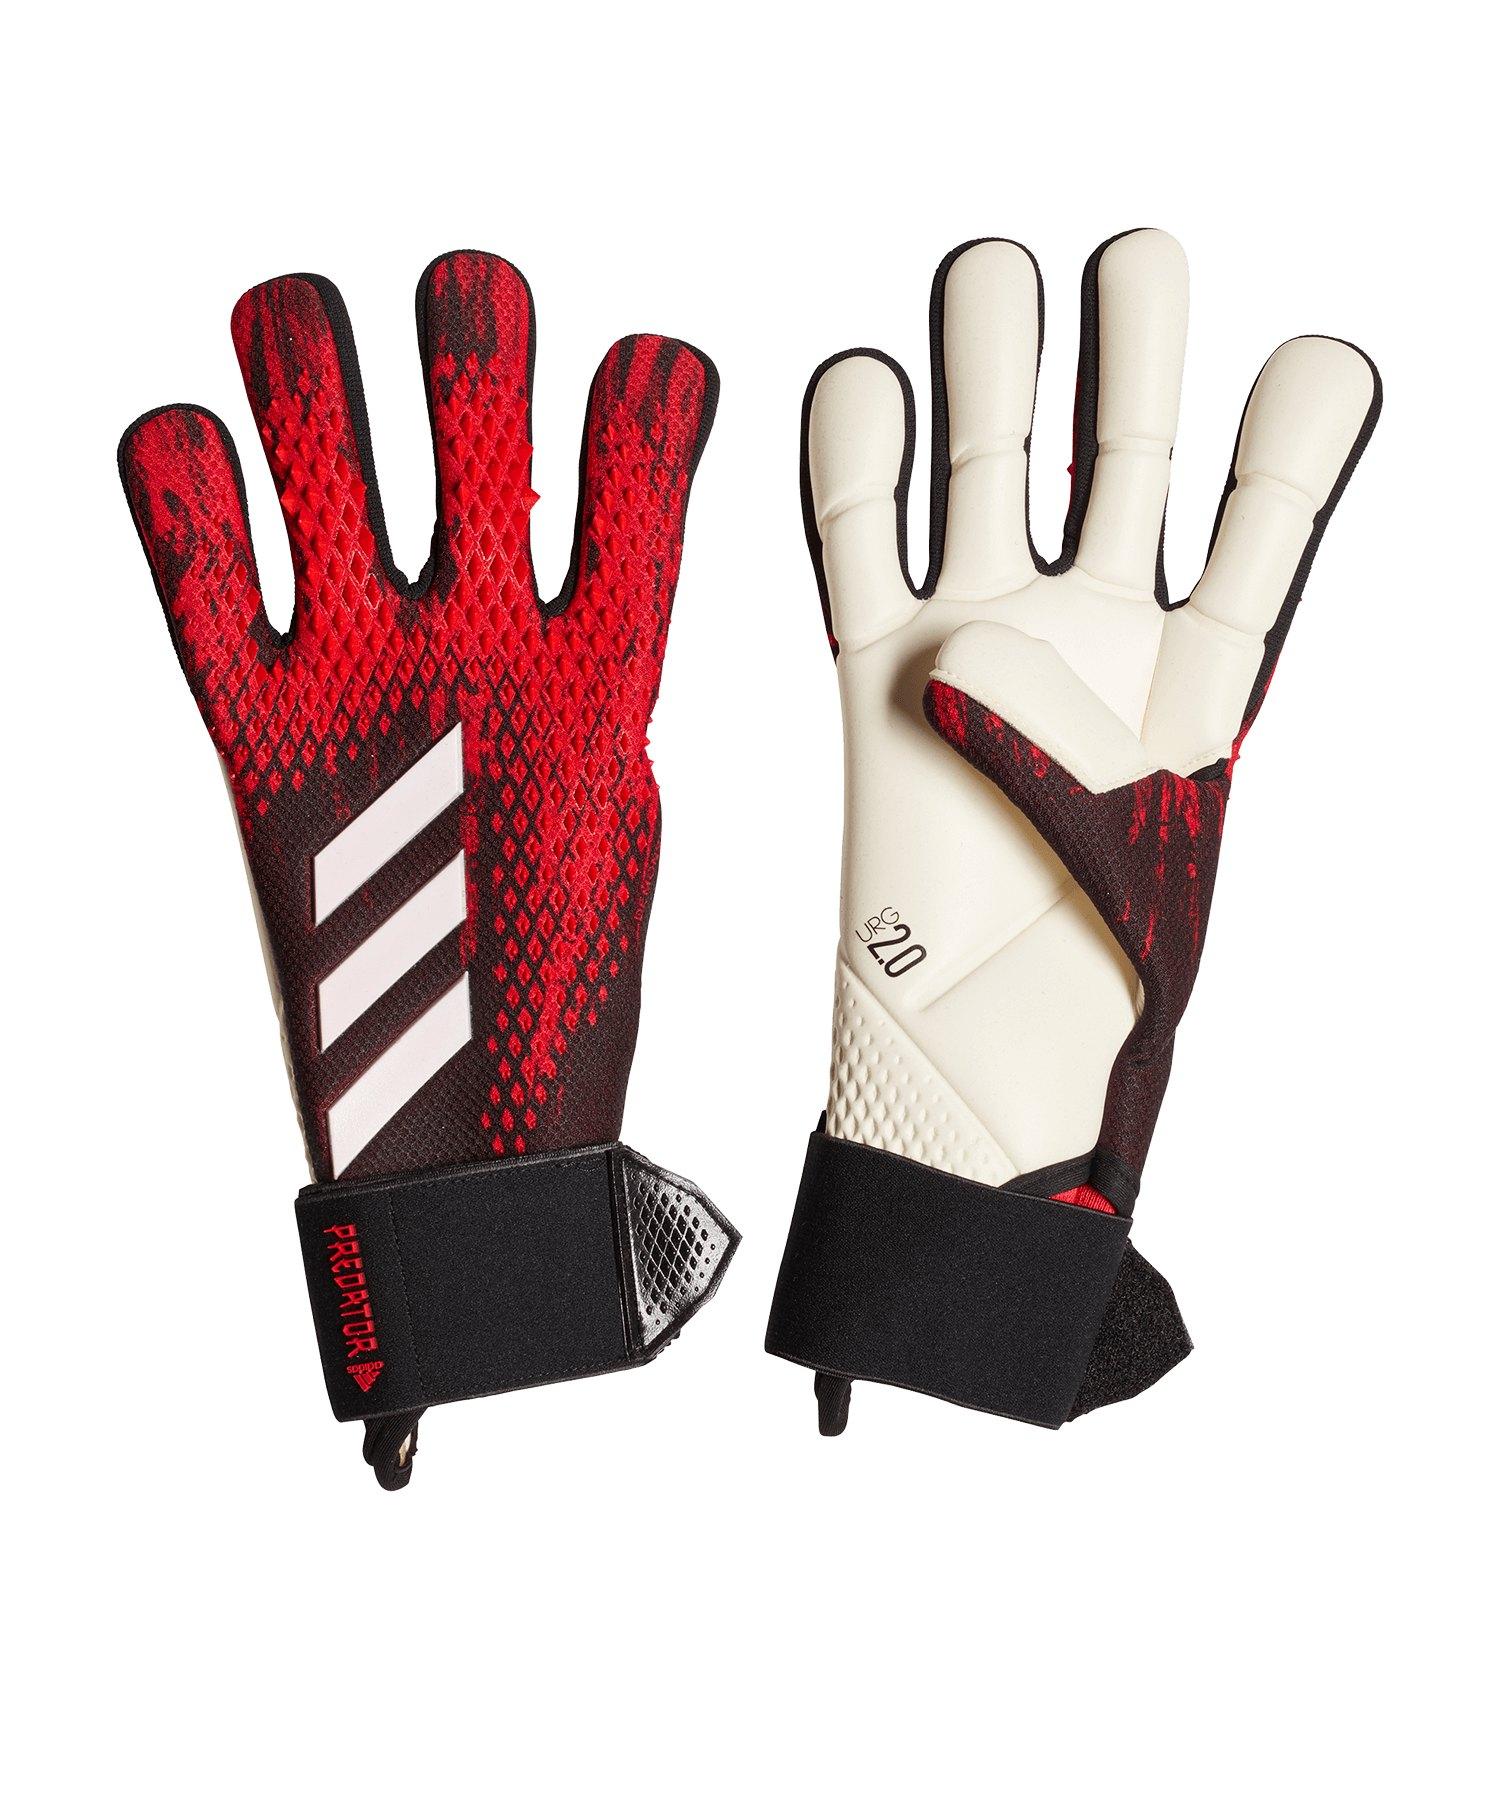 adidas Predator Com TW-Handschuh Schwarz Rot - schwarz